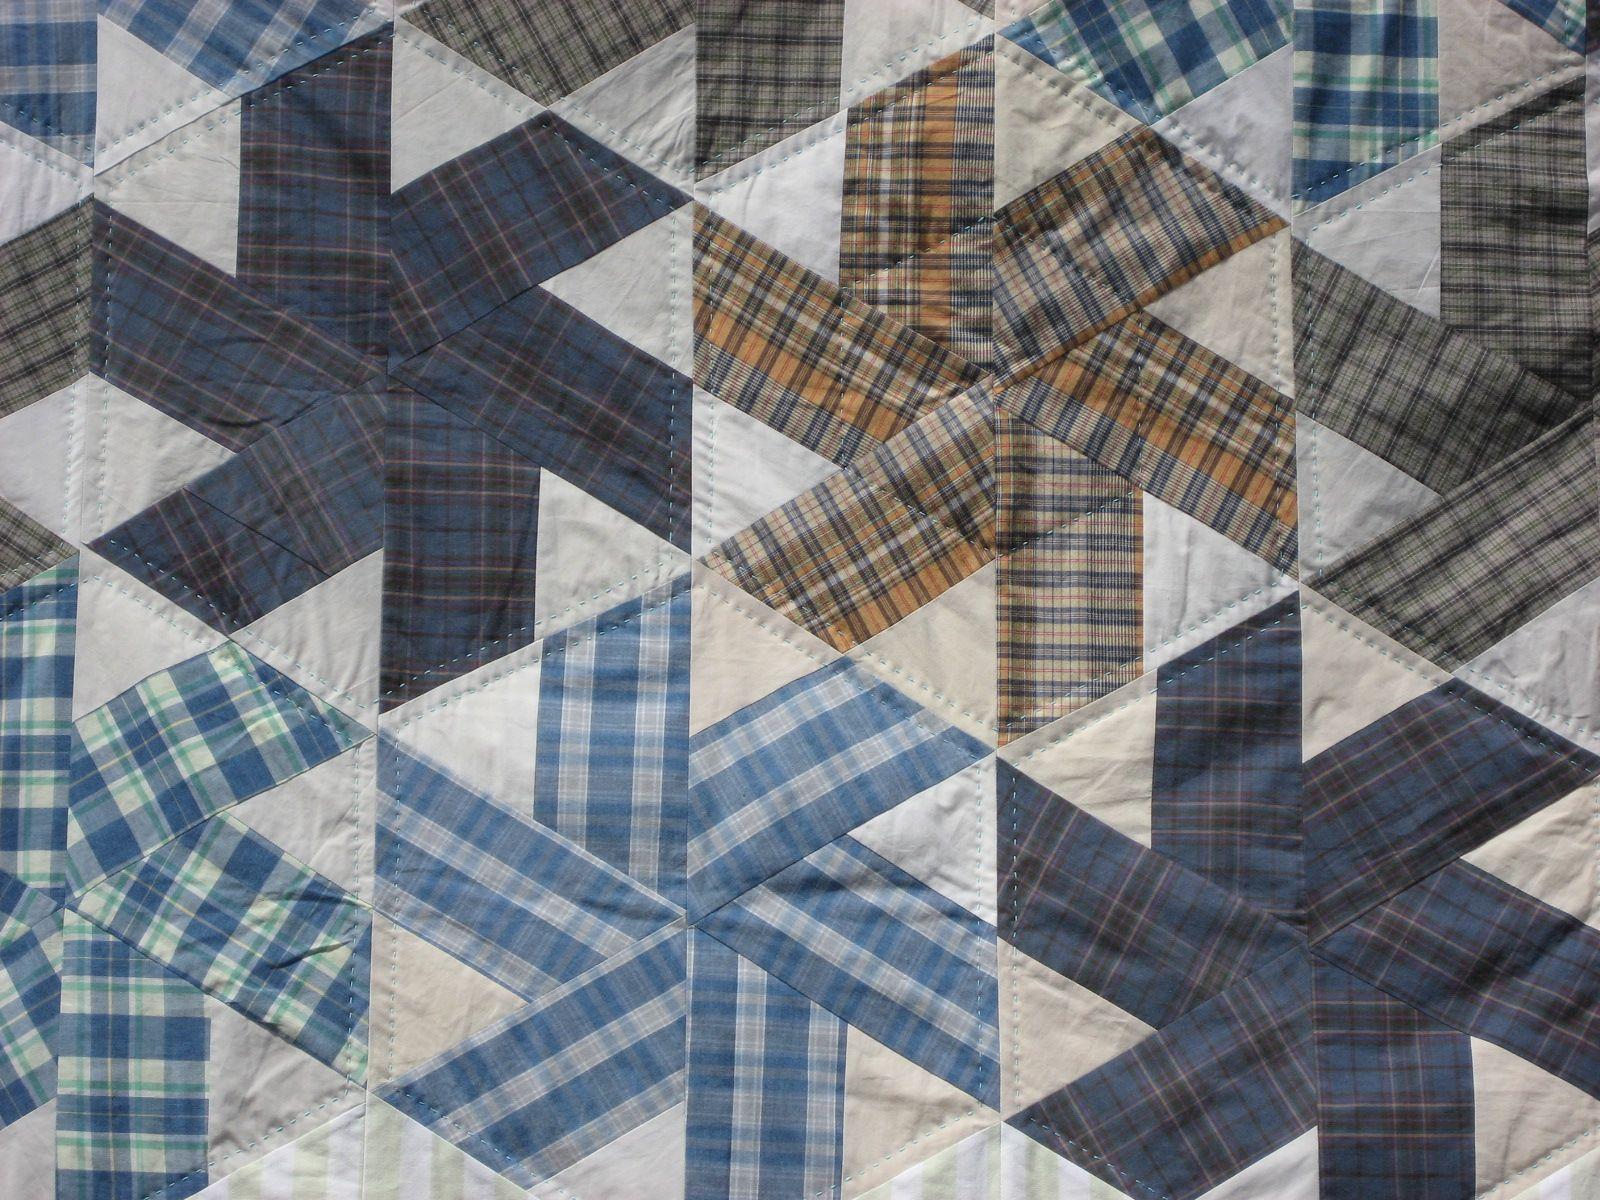 SWIRLS QUILT FROM MENS' SHIRTS   Shirt quilts, Patterns and Hand ... : quilt patterns for men - Adamdwight.com